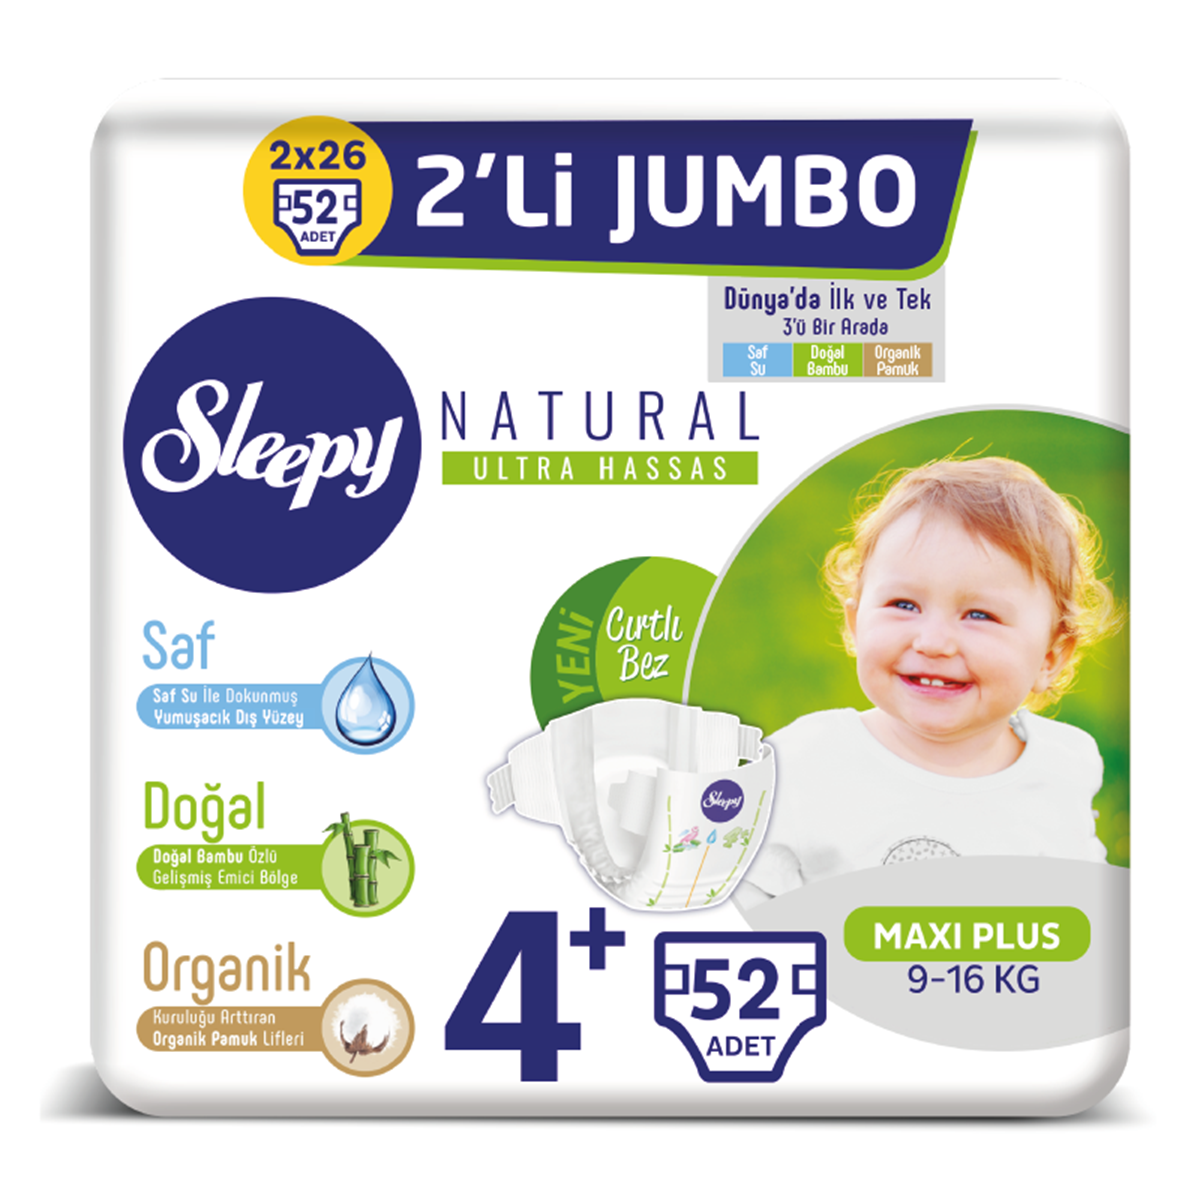 Sleepy Natural Bebek Bezi 4+ Numara Maxi Plus 2'Lİ JUMBO 52 Adet